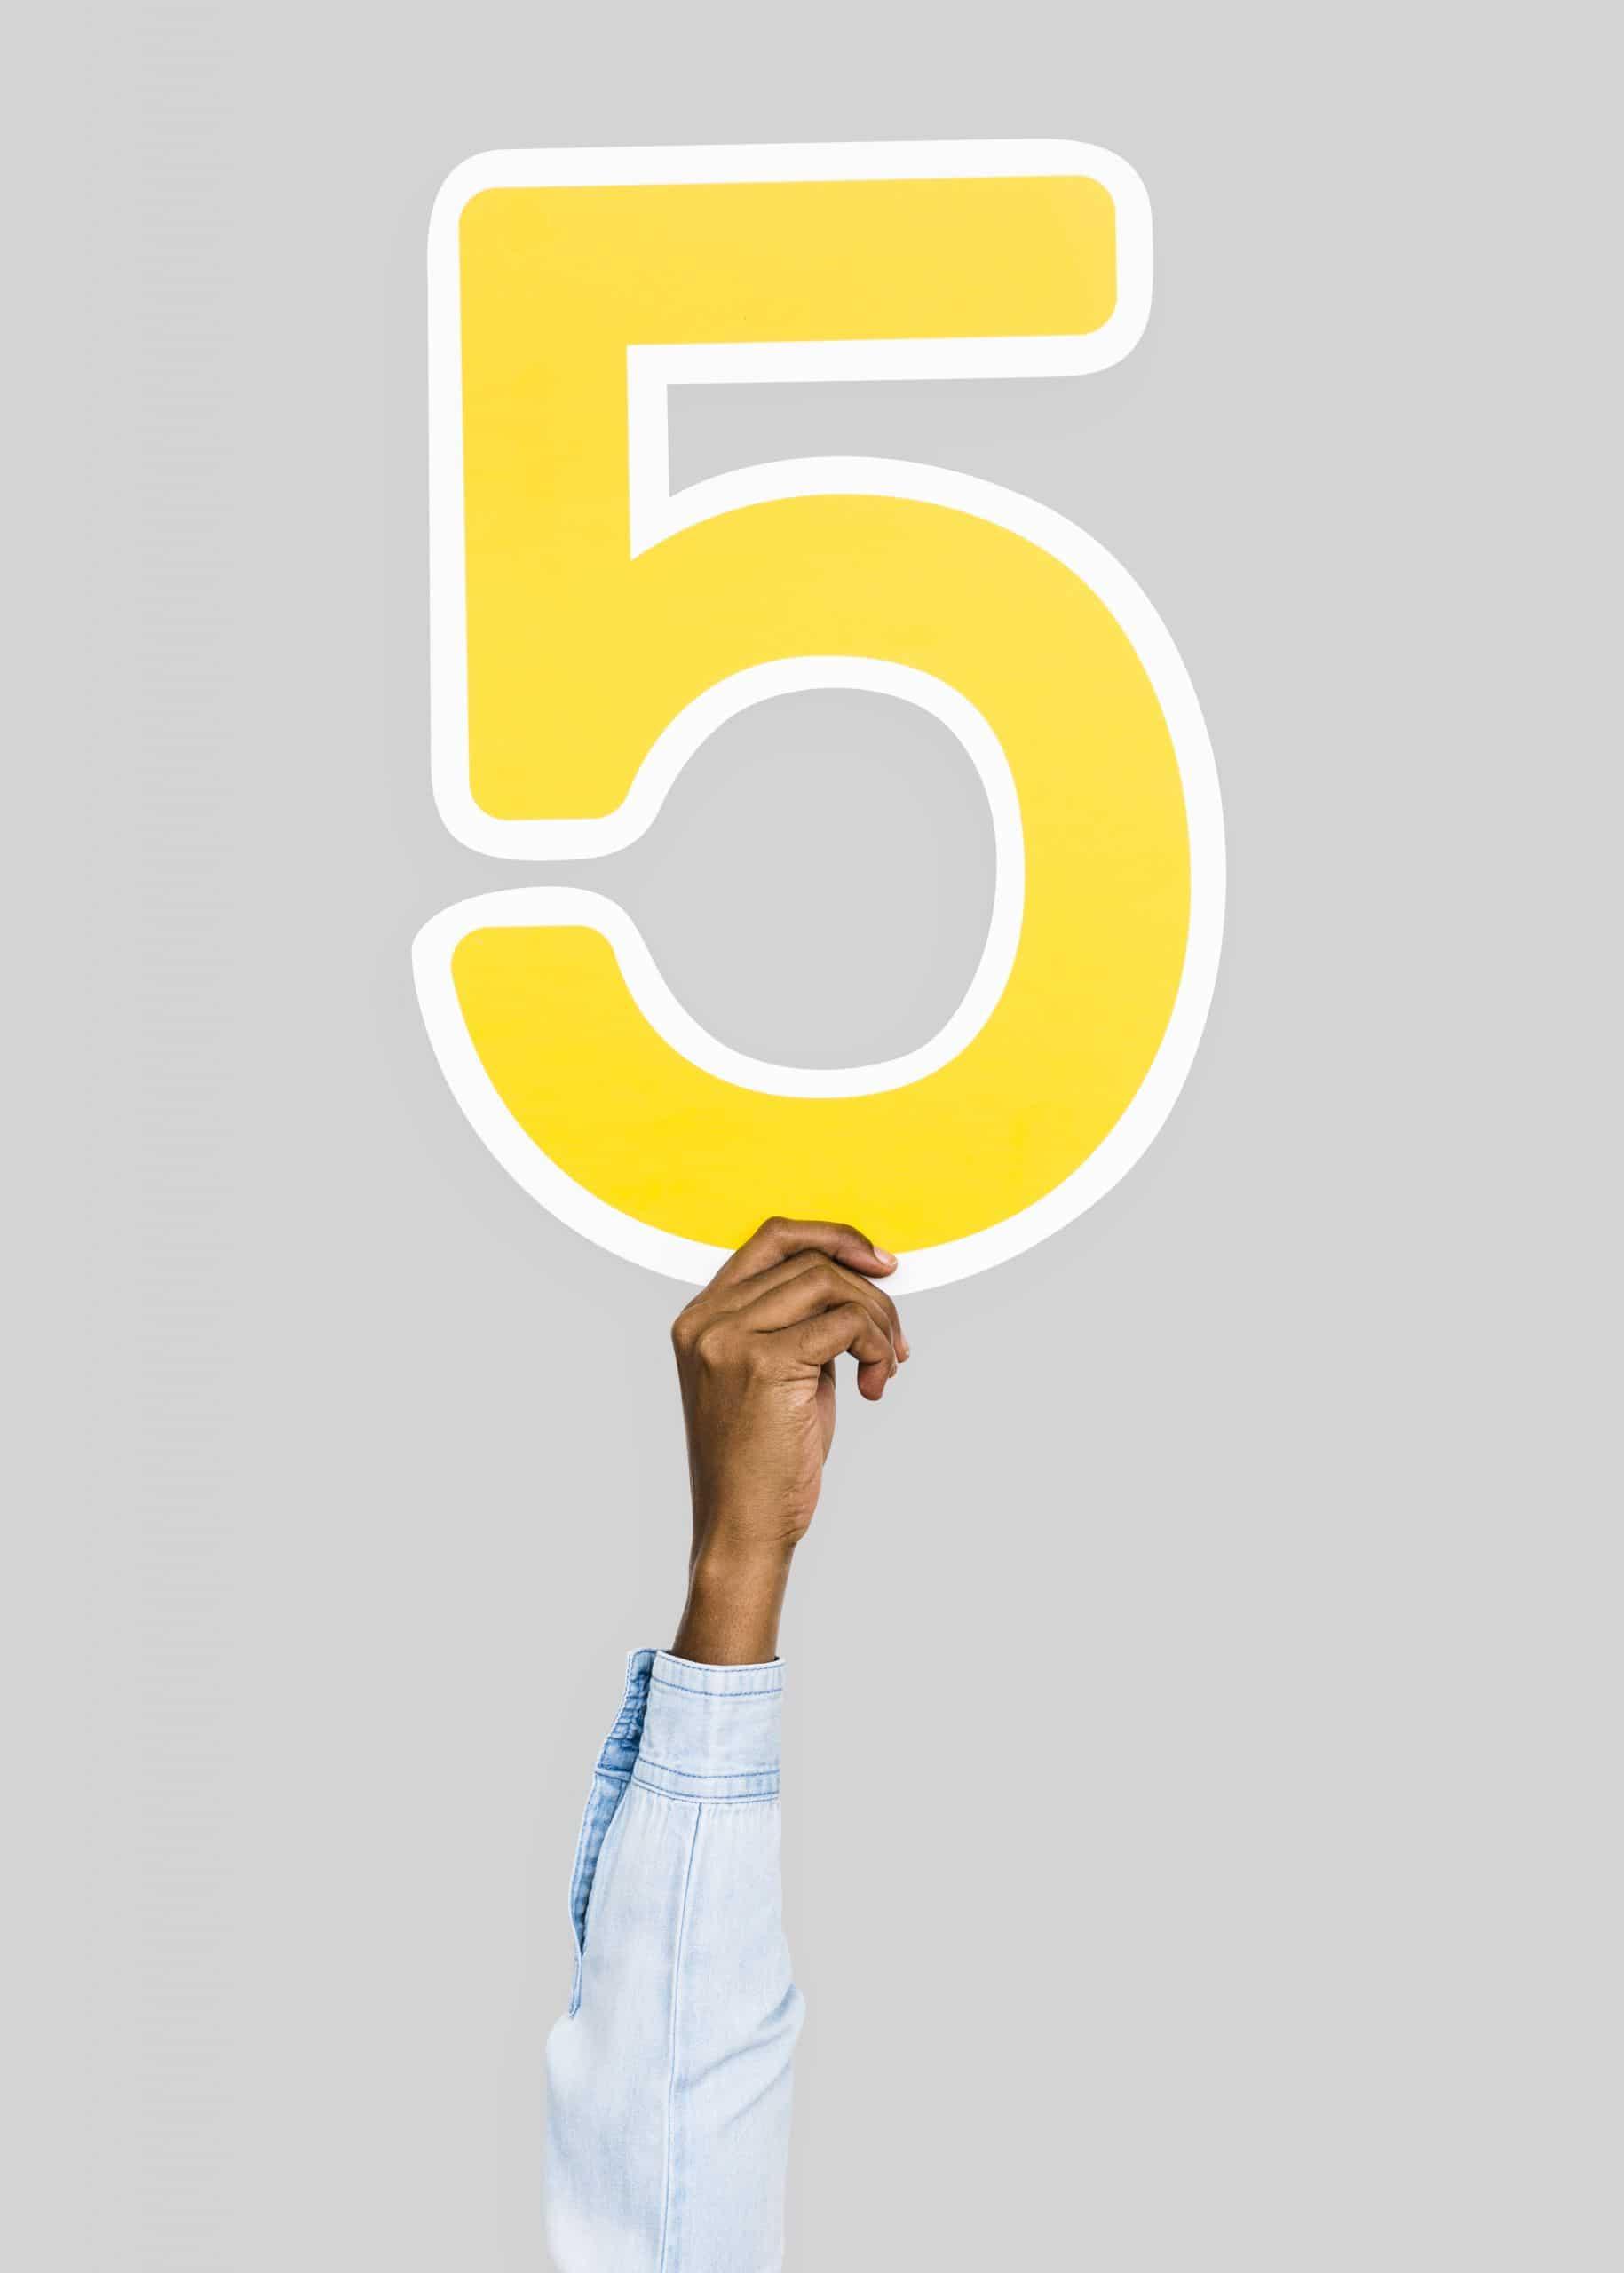 5 Strategii Eficiente Pentru A Creste Vizibilitatea In Mediul Online